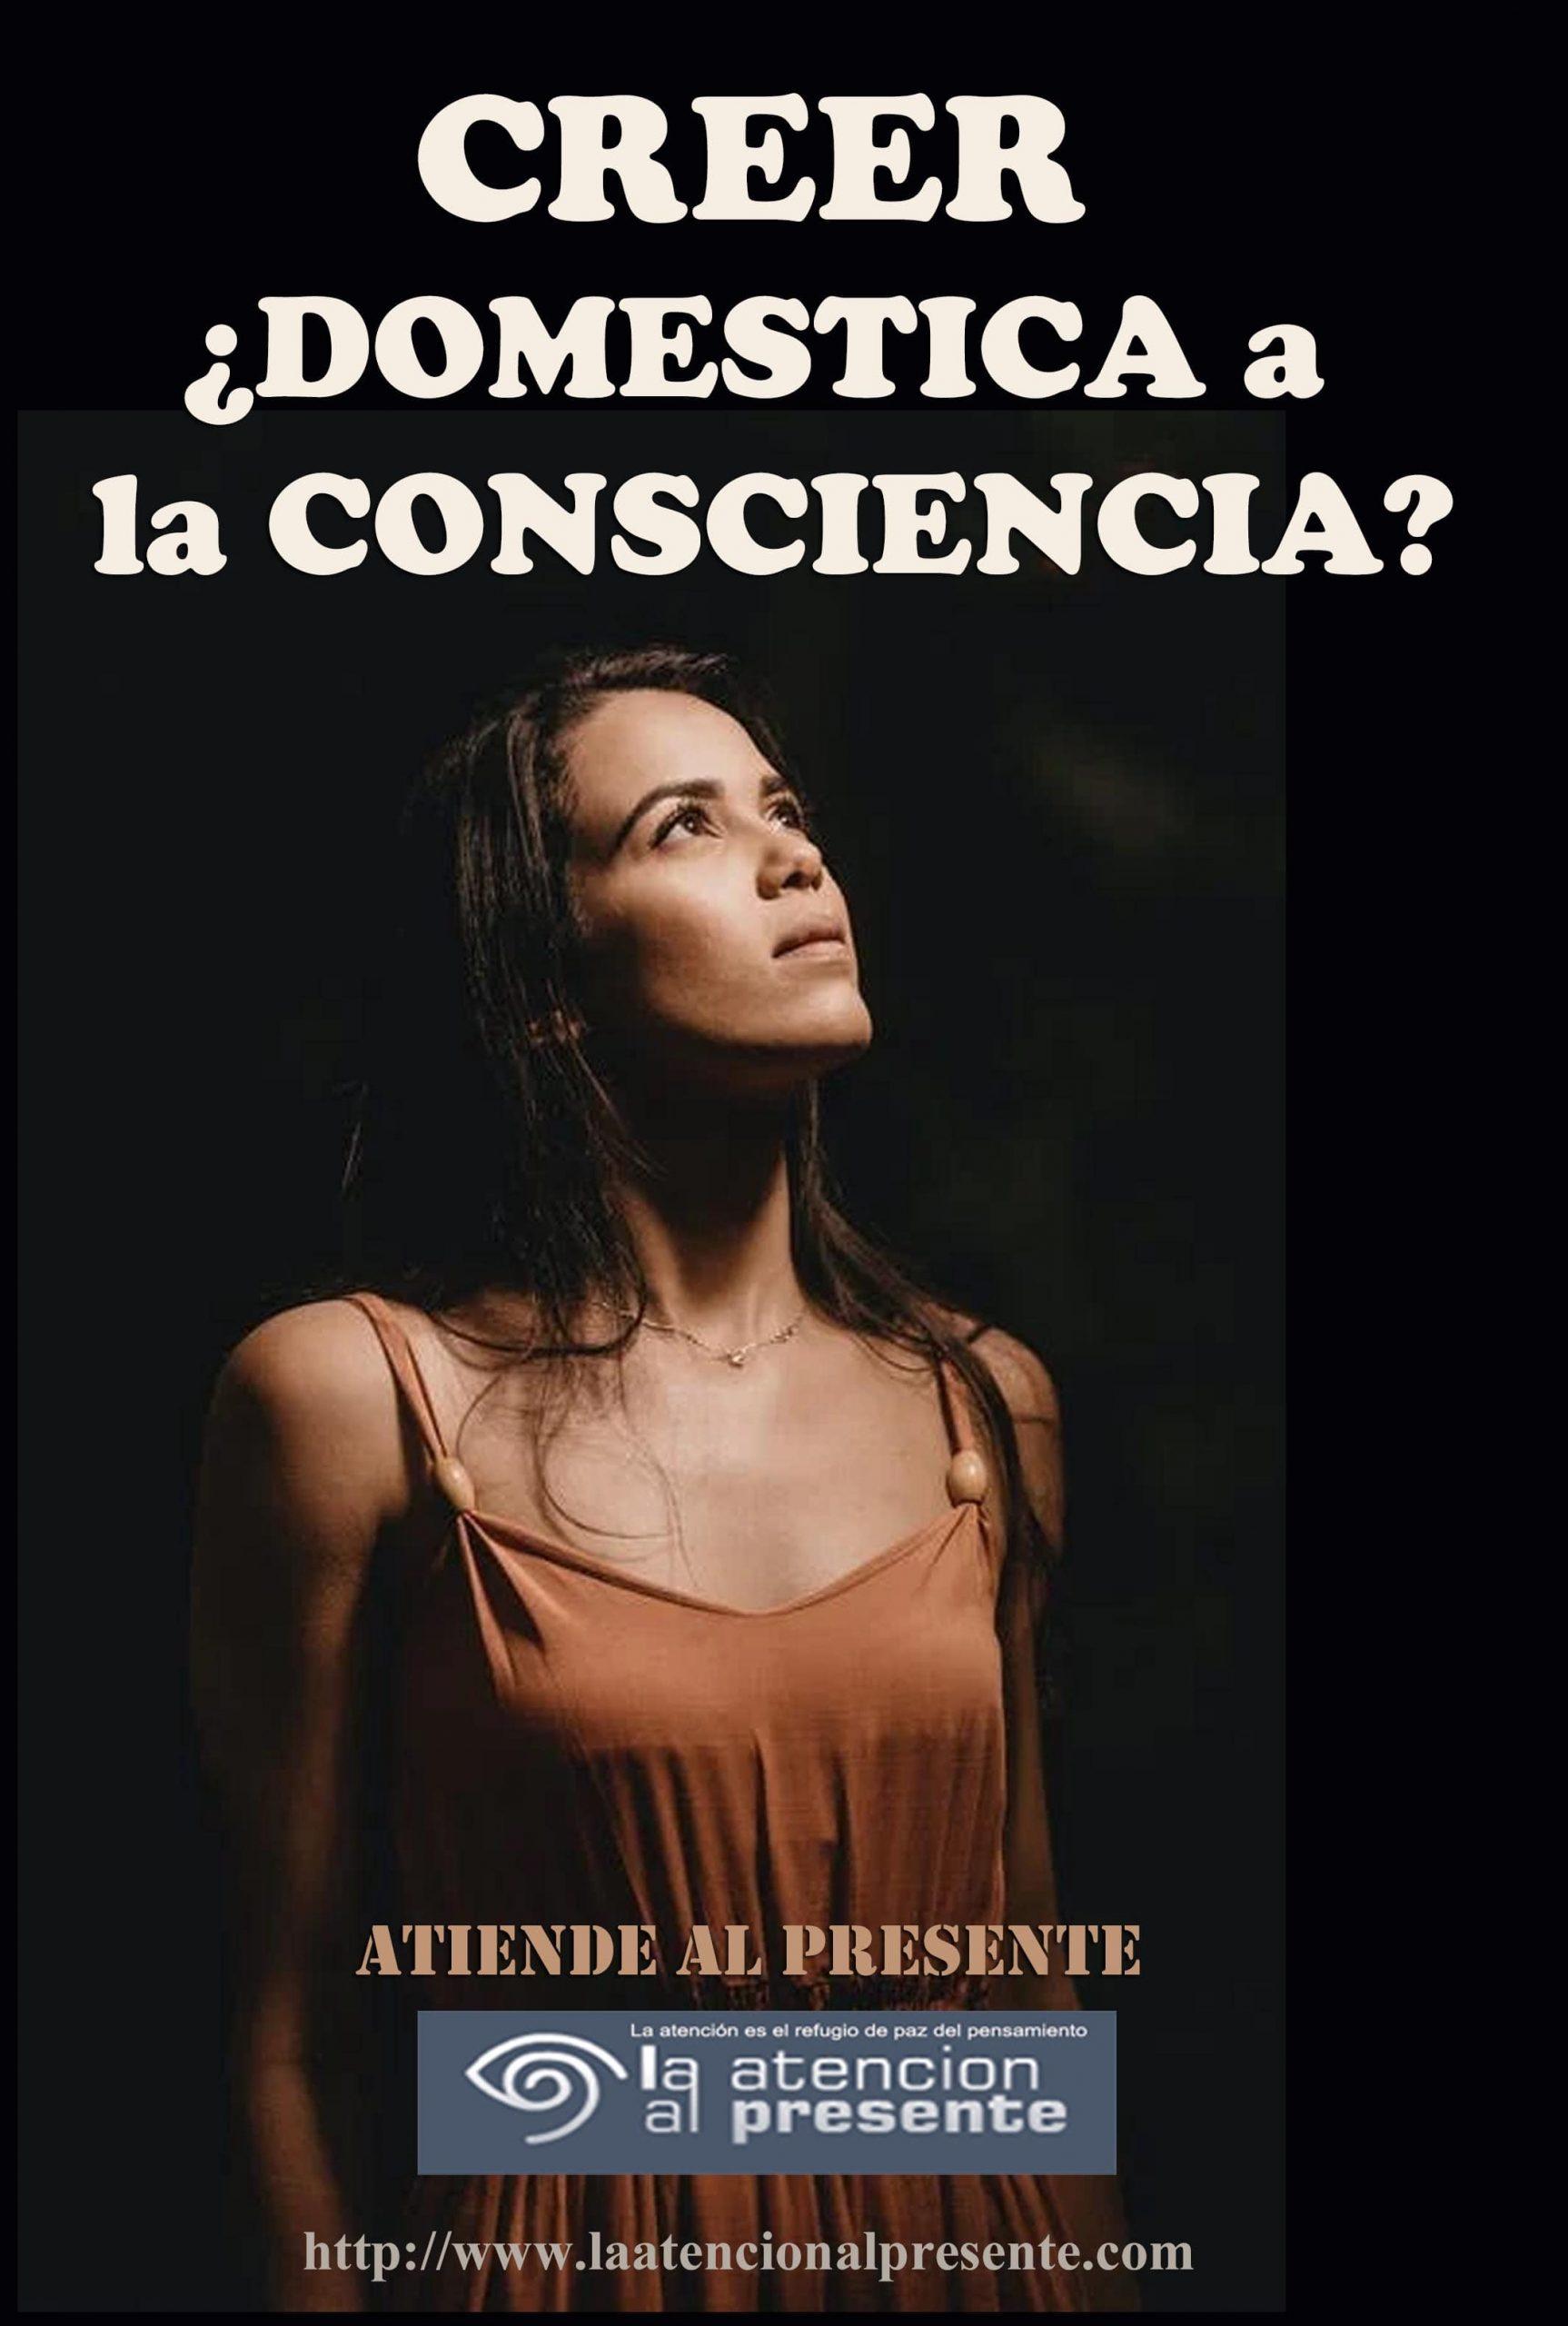 21 de Abril Isa CREER DOMESTICA A LA CONSCIENCIA min scaled